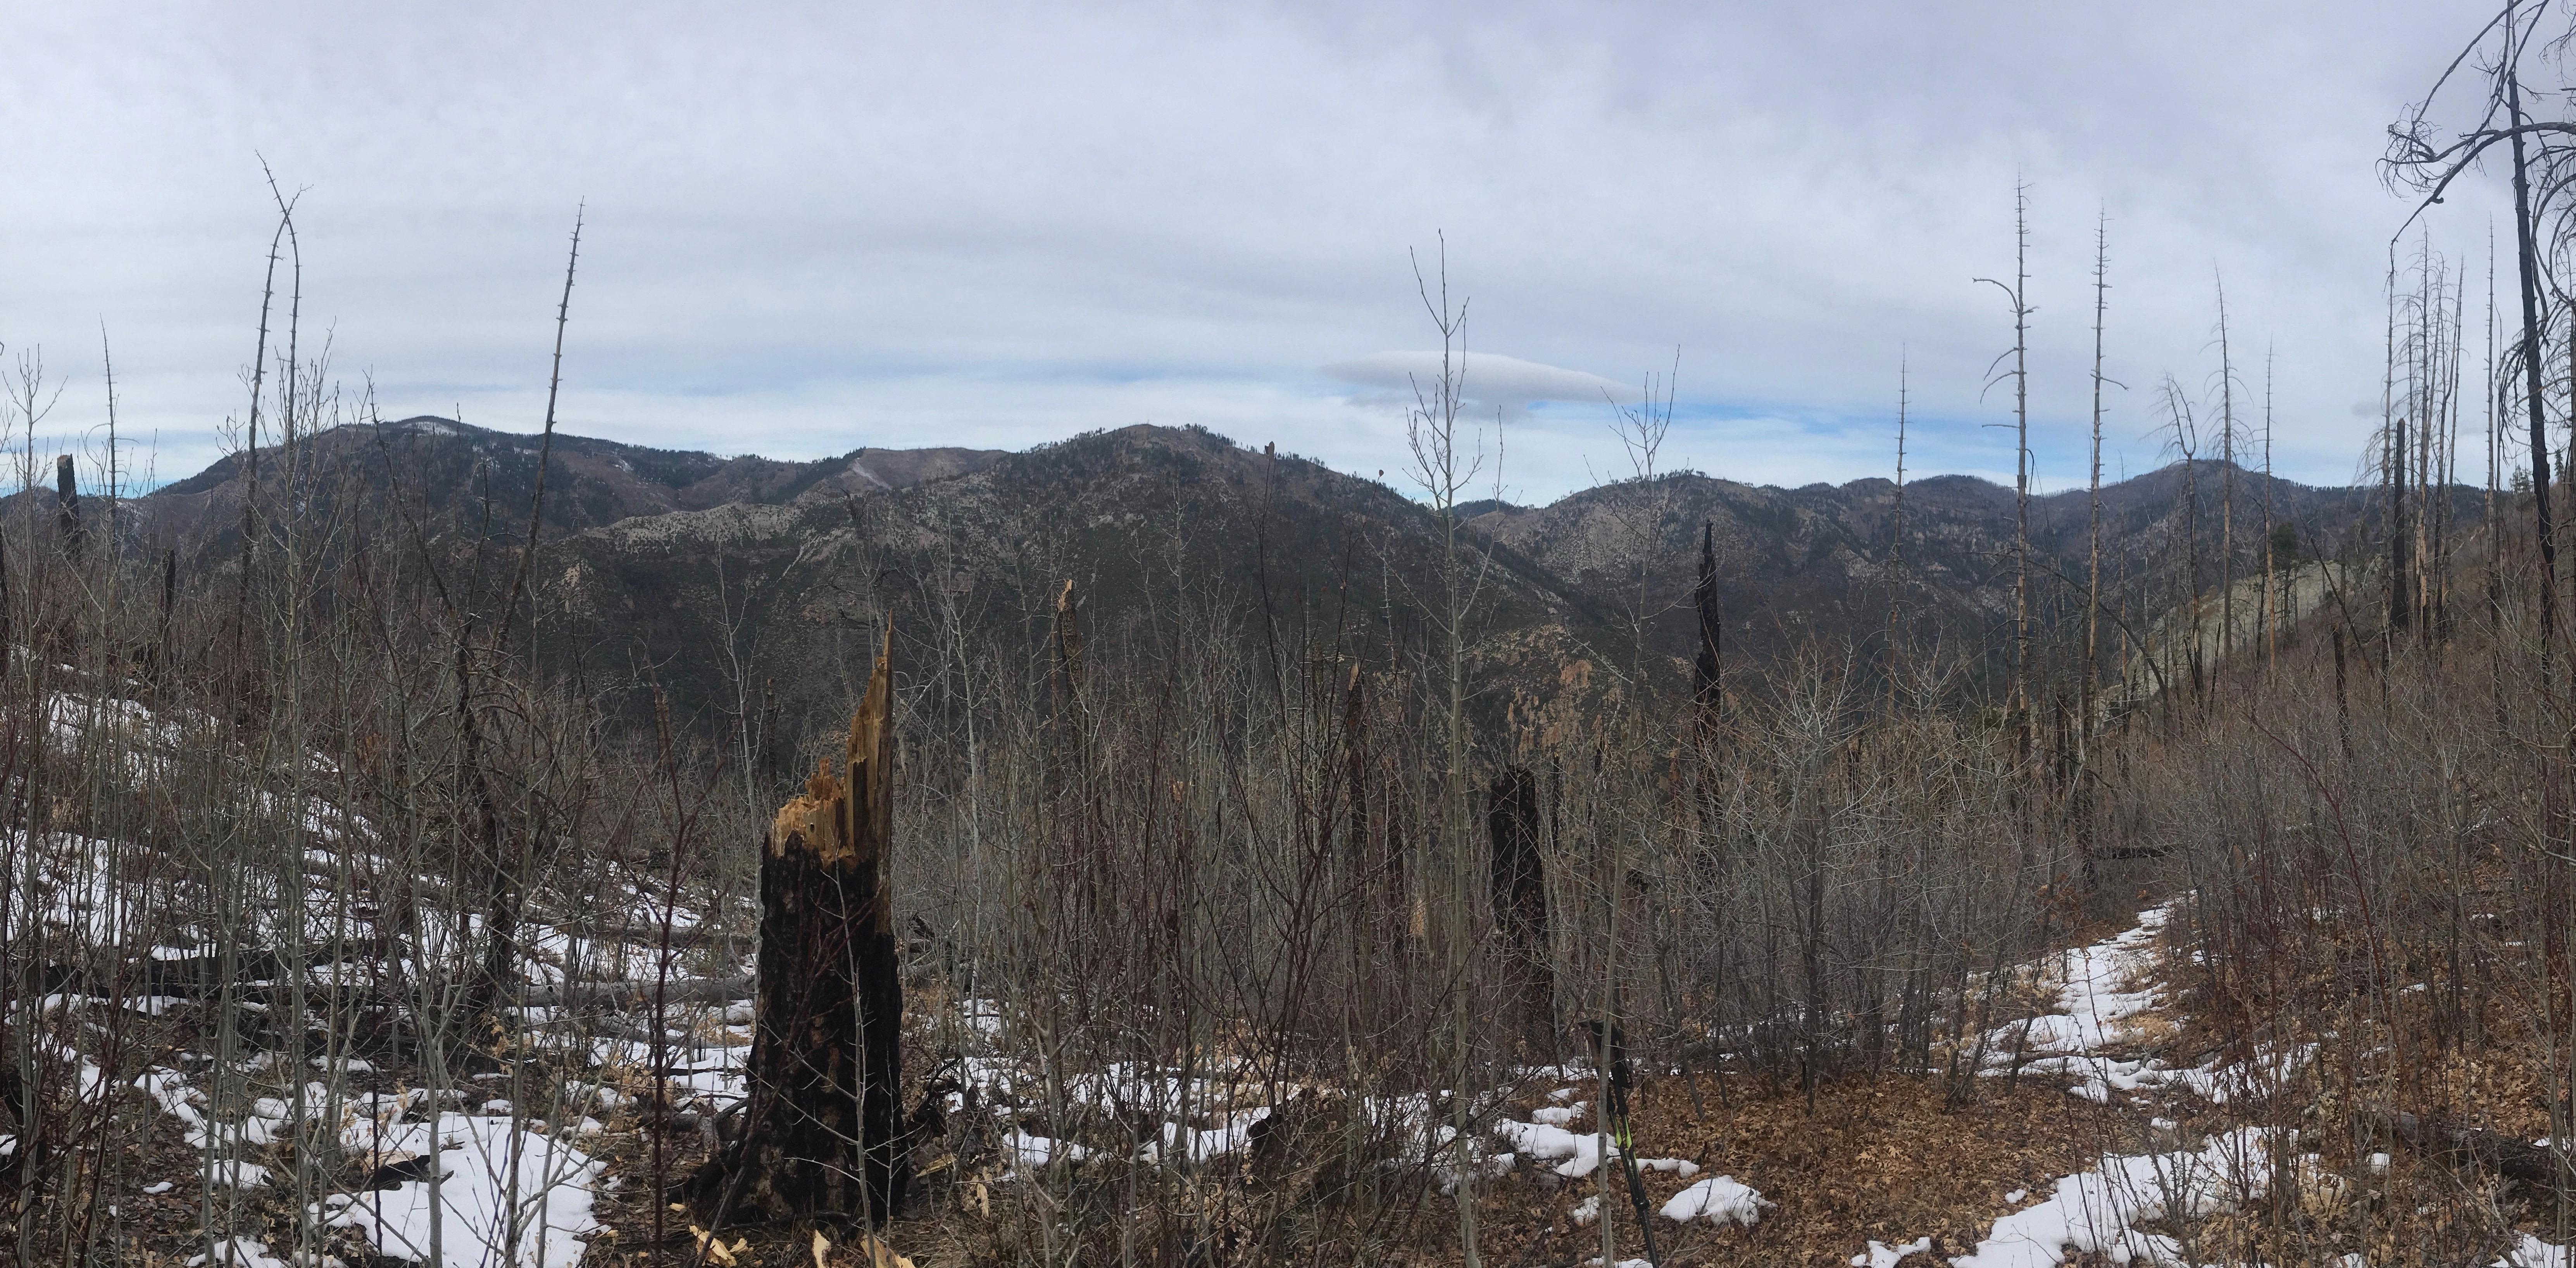 12 Windy Gap looking over Big Dry Creek